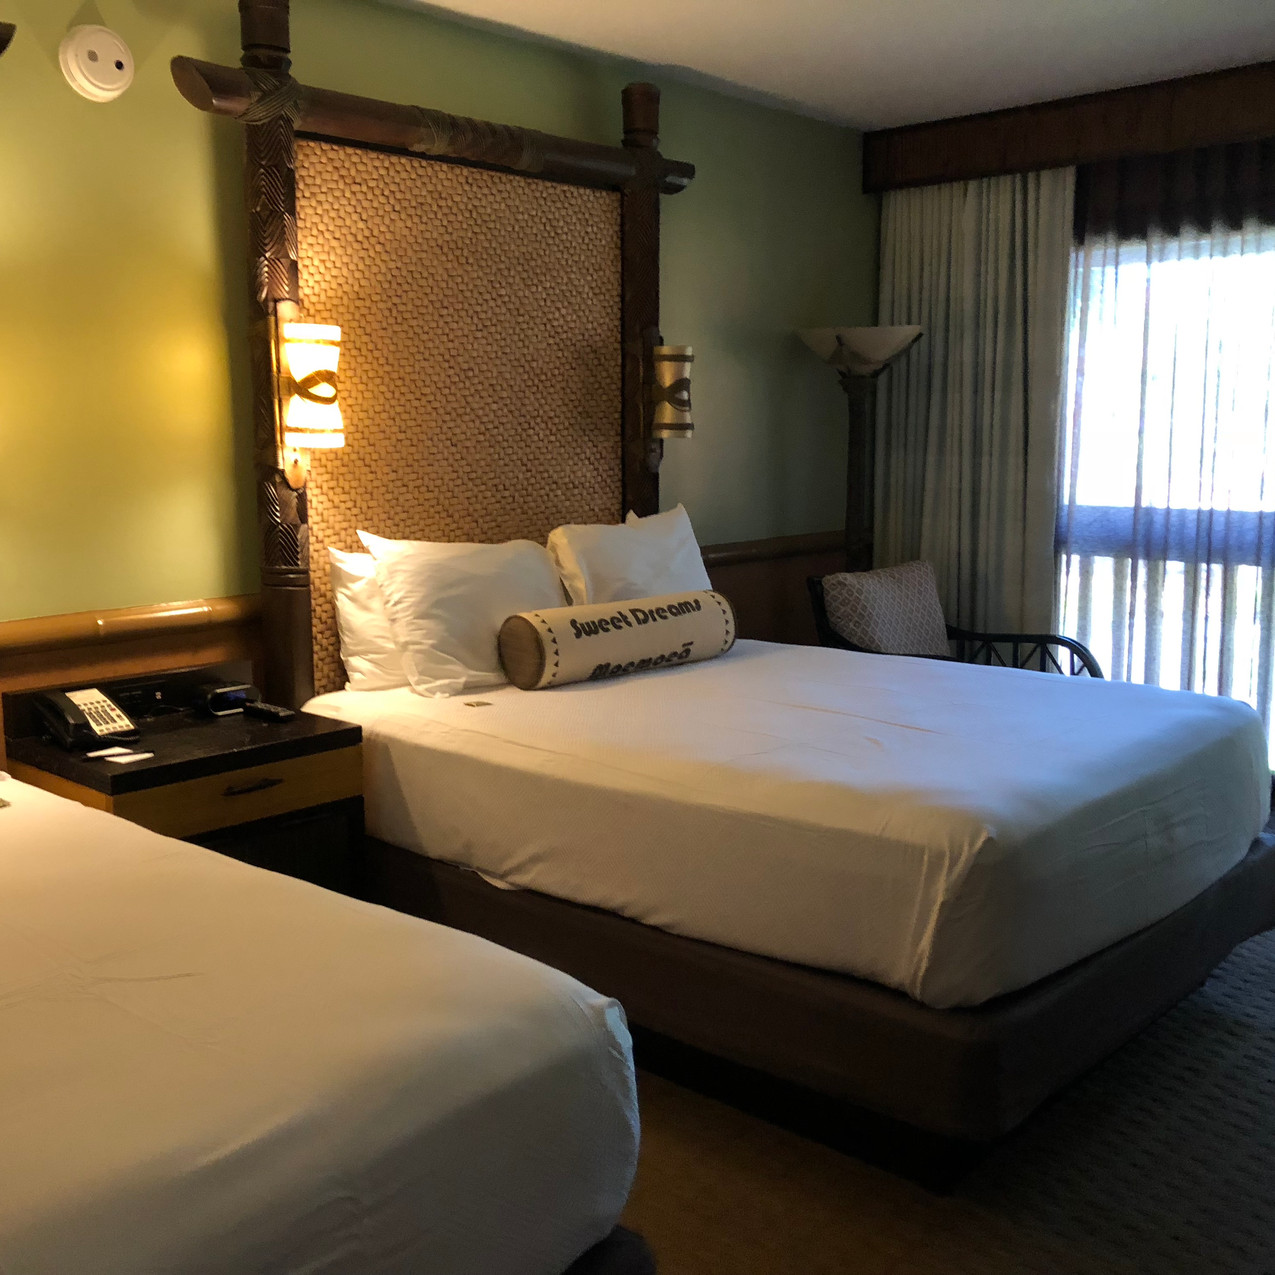 beds at Disney's Polynesian Village Resort